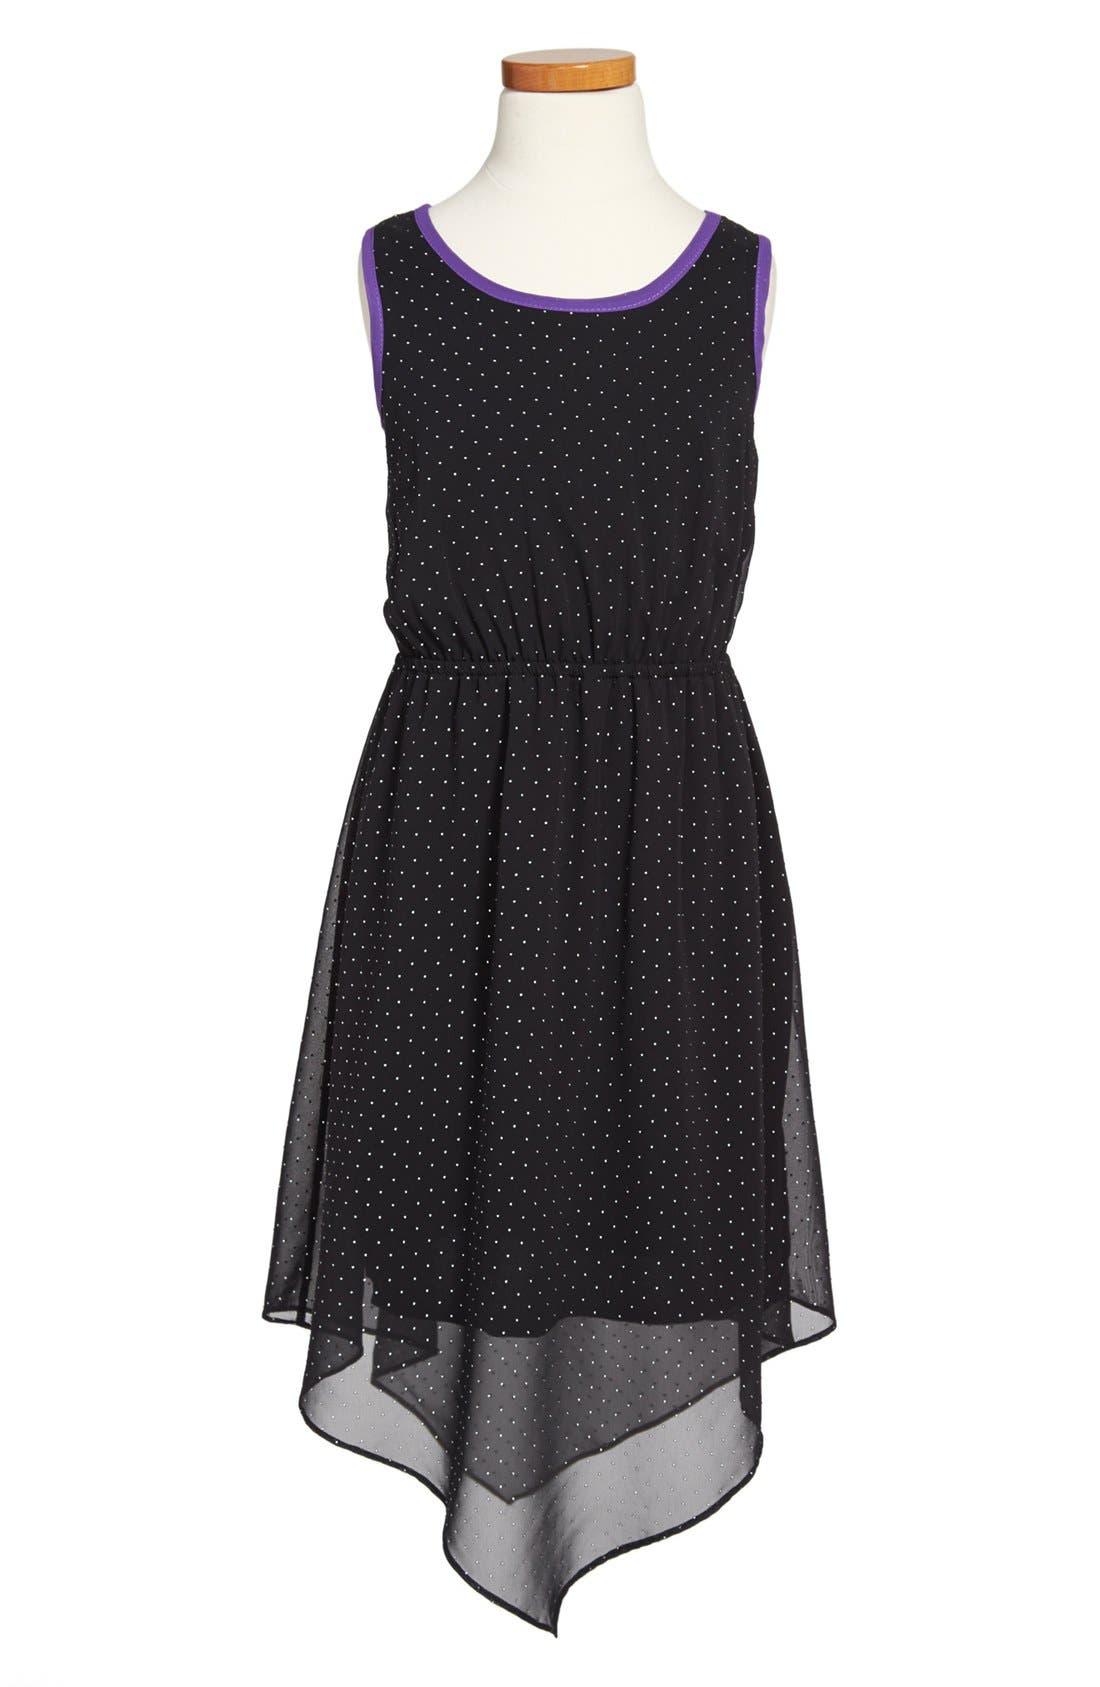 Alternate Image 1 Selected - Soprano Studded Dipped Hem Sleeveless Dress (Big Girls)